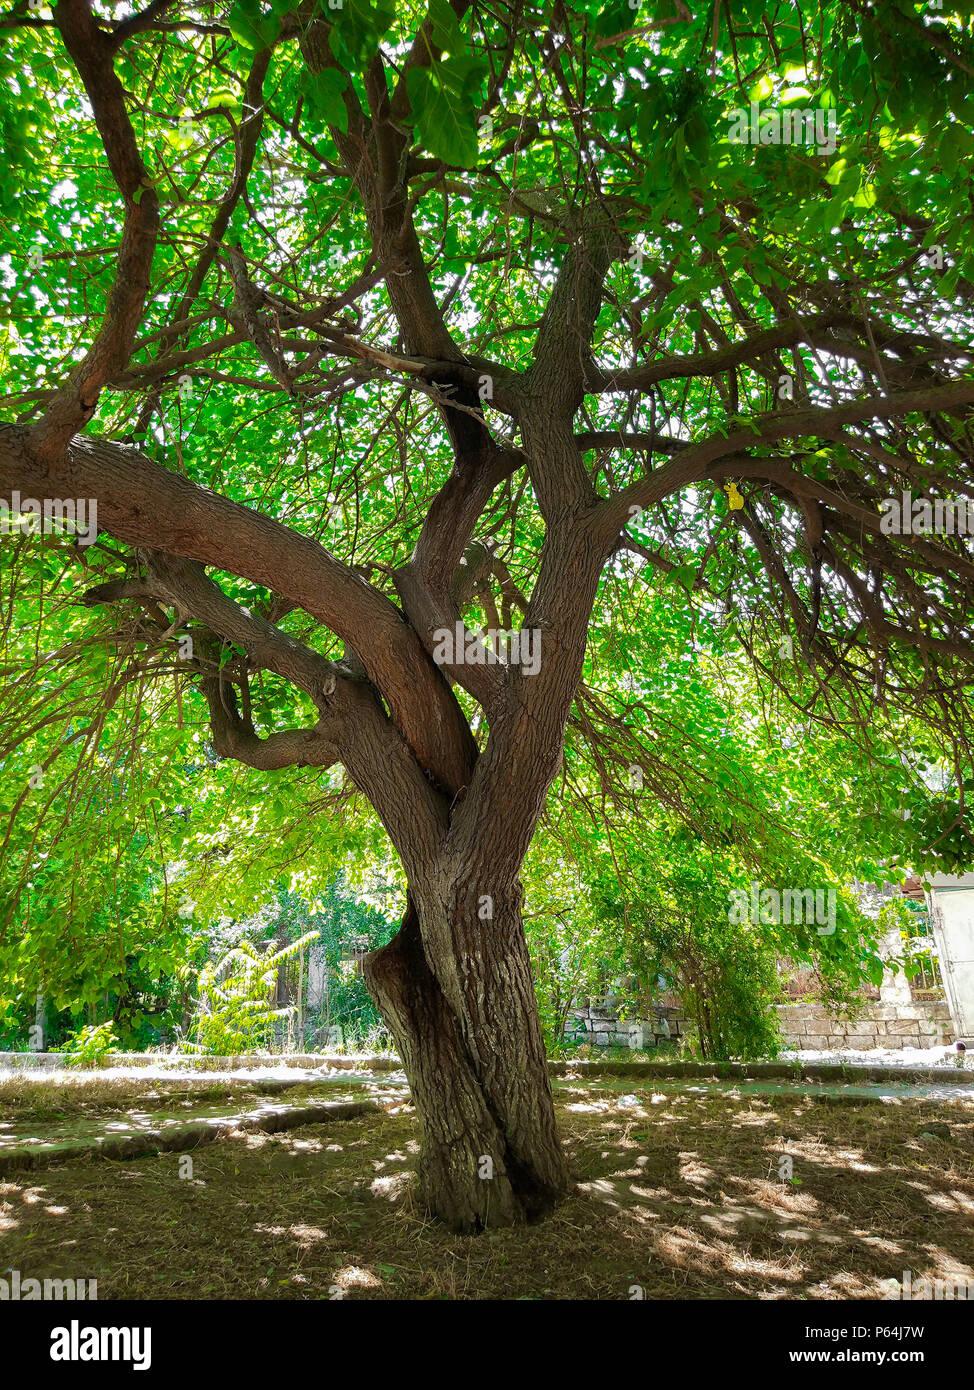 Mulberry Garden Stock Photos & Mulberry Garden Stock Images - Alamy